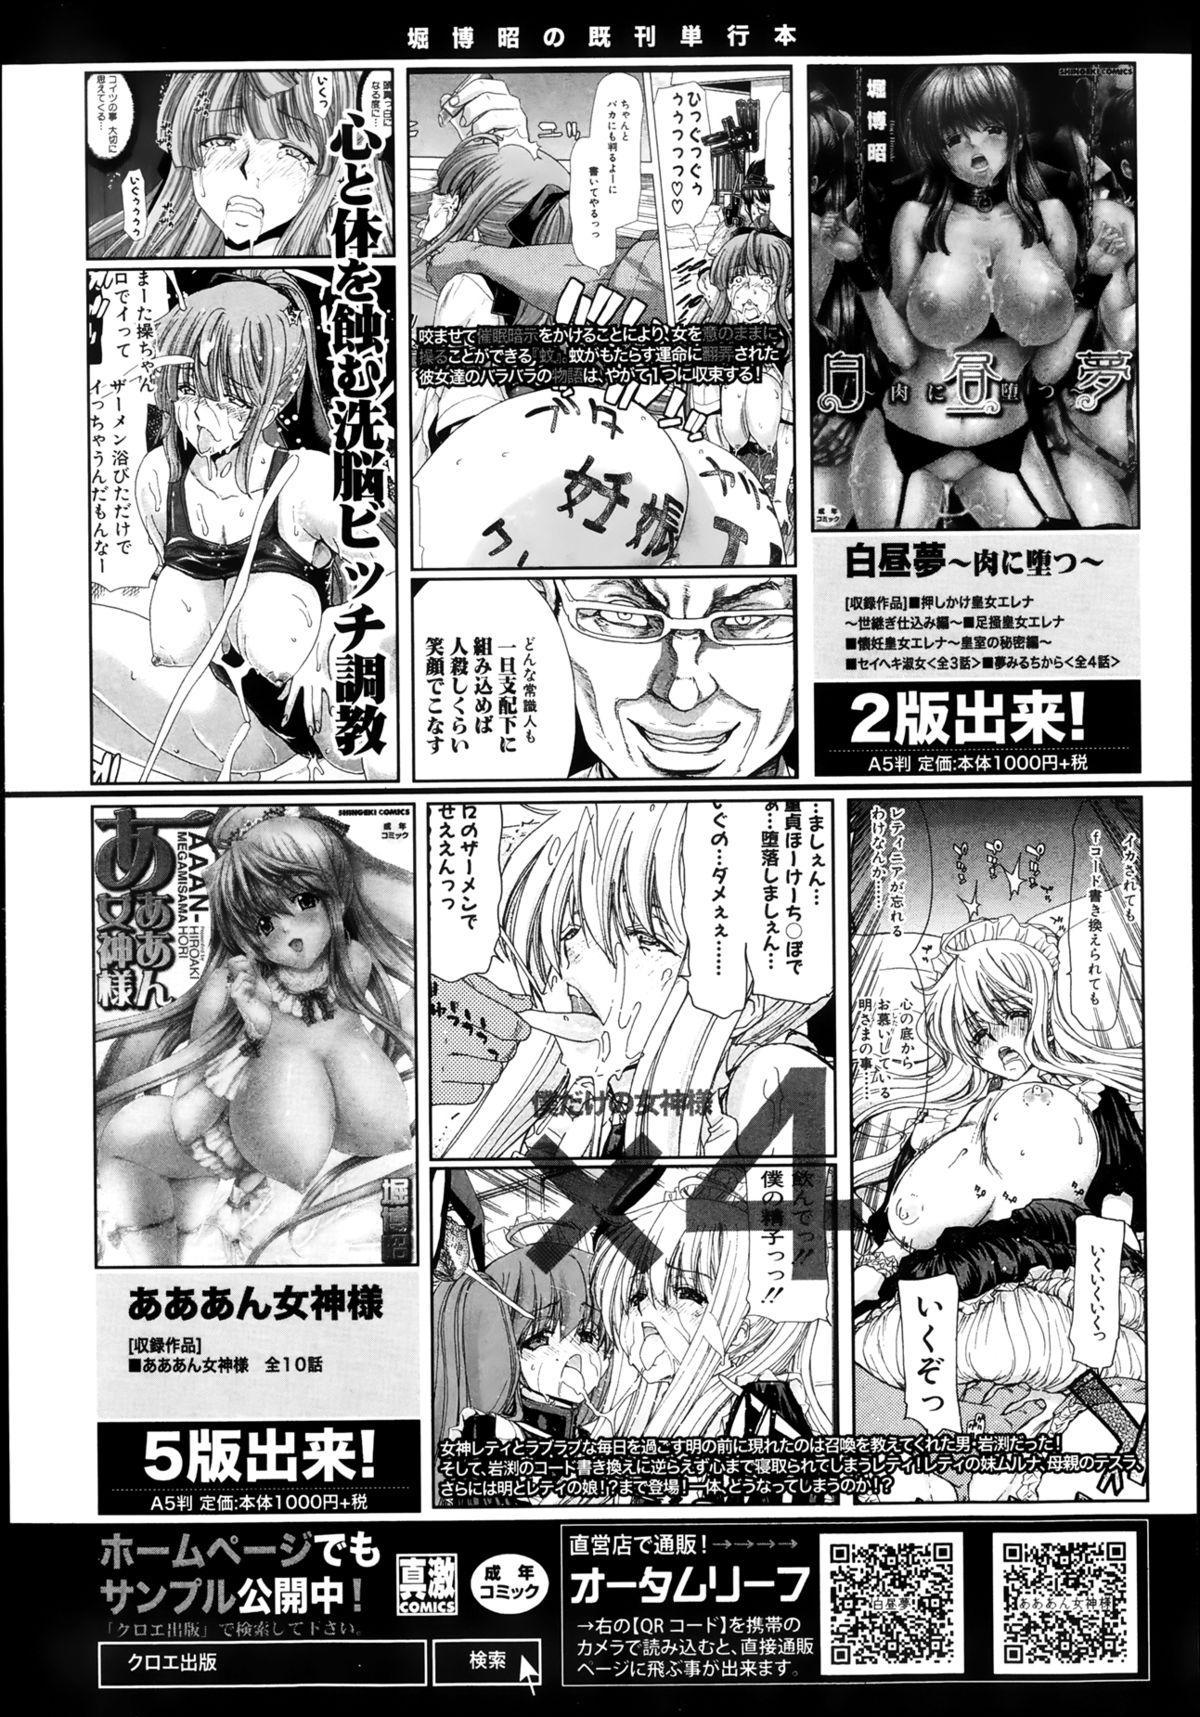 COMIC Shingeki 2013-08 238